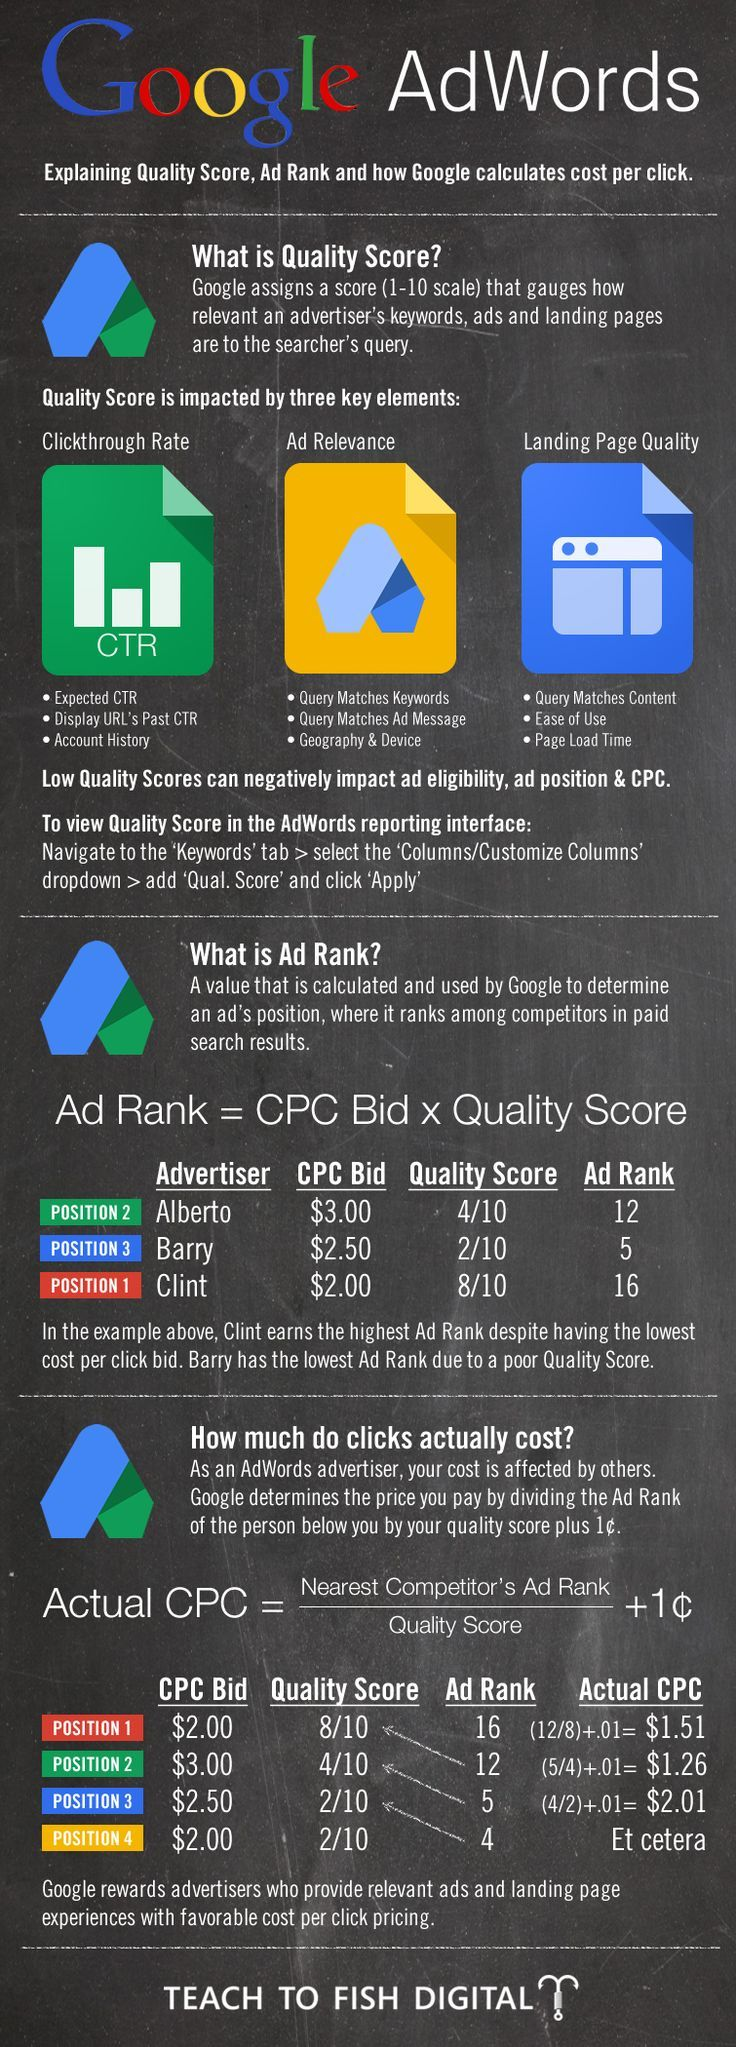 Google Adwords Quality Score Infographic via Chris Sietsema - http://teachtofishdigital.com/